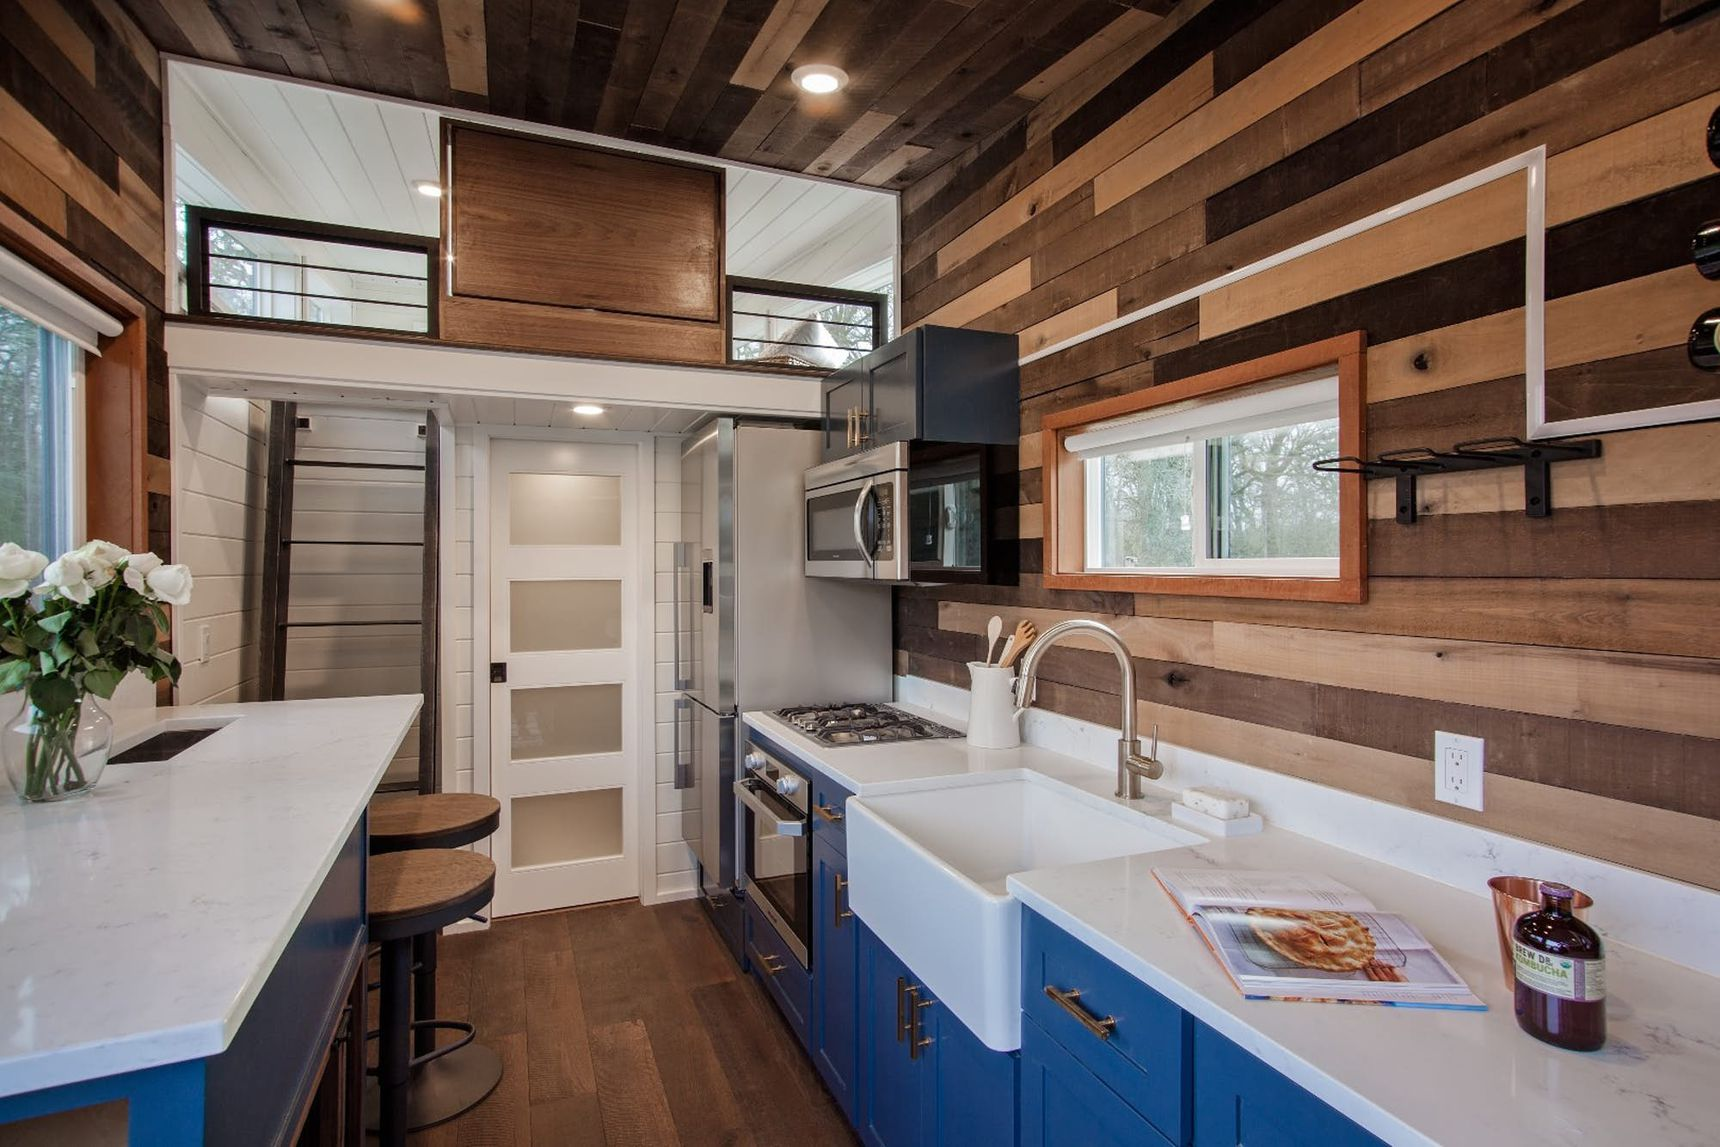 Top Tiny Homes - Breezeway Kitchen